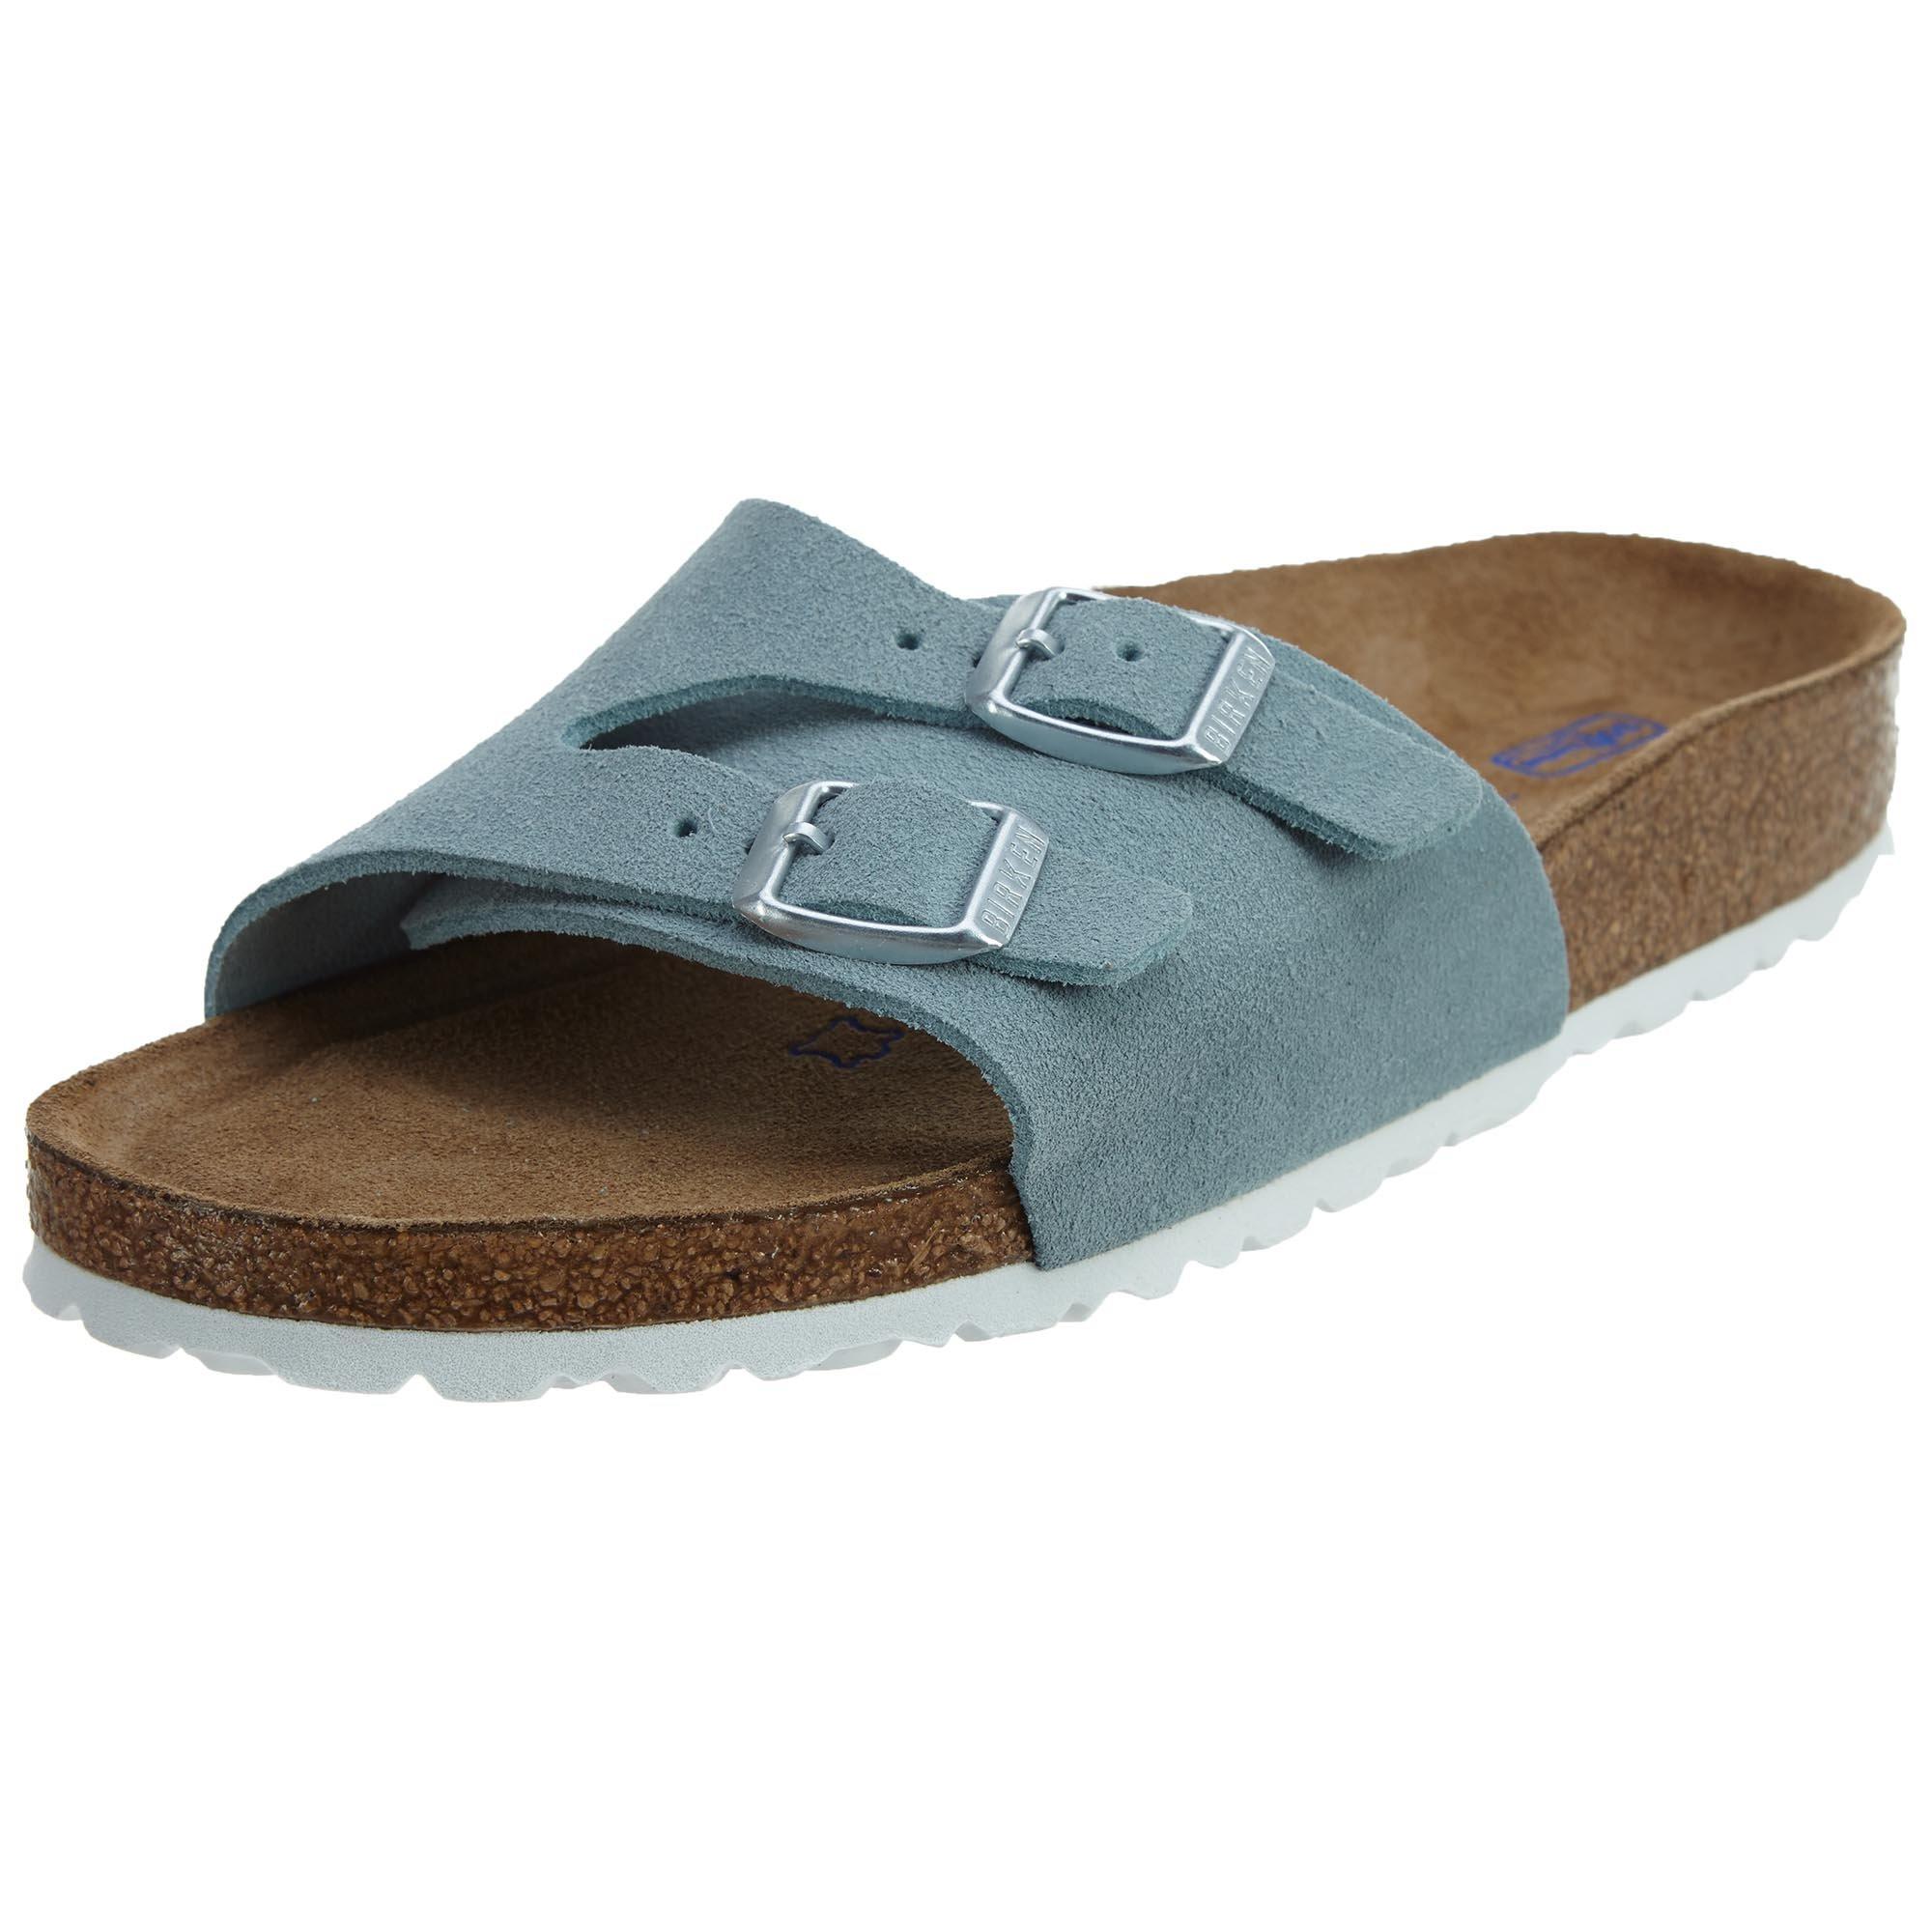 Birkenstock Vaduz Sandal Womens Style: 1005142-Blue NARROW-39 (8 Size: 39 (8-8.5)